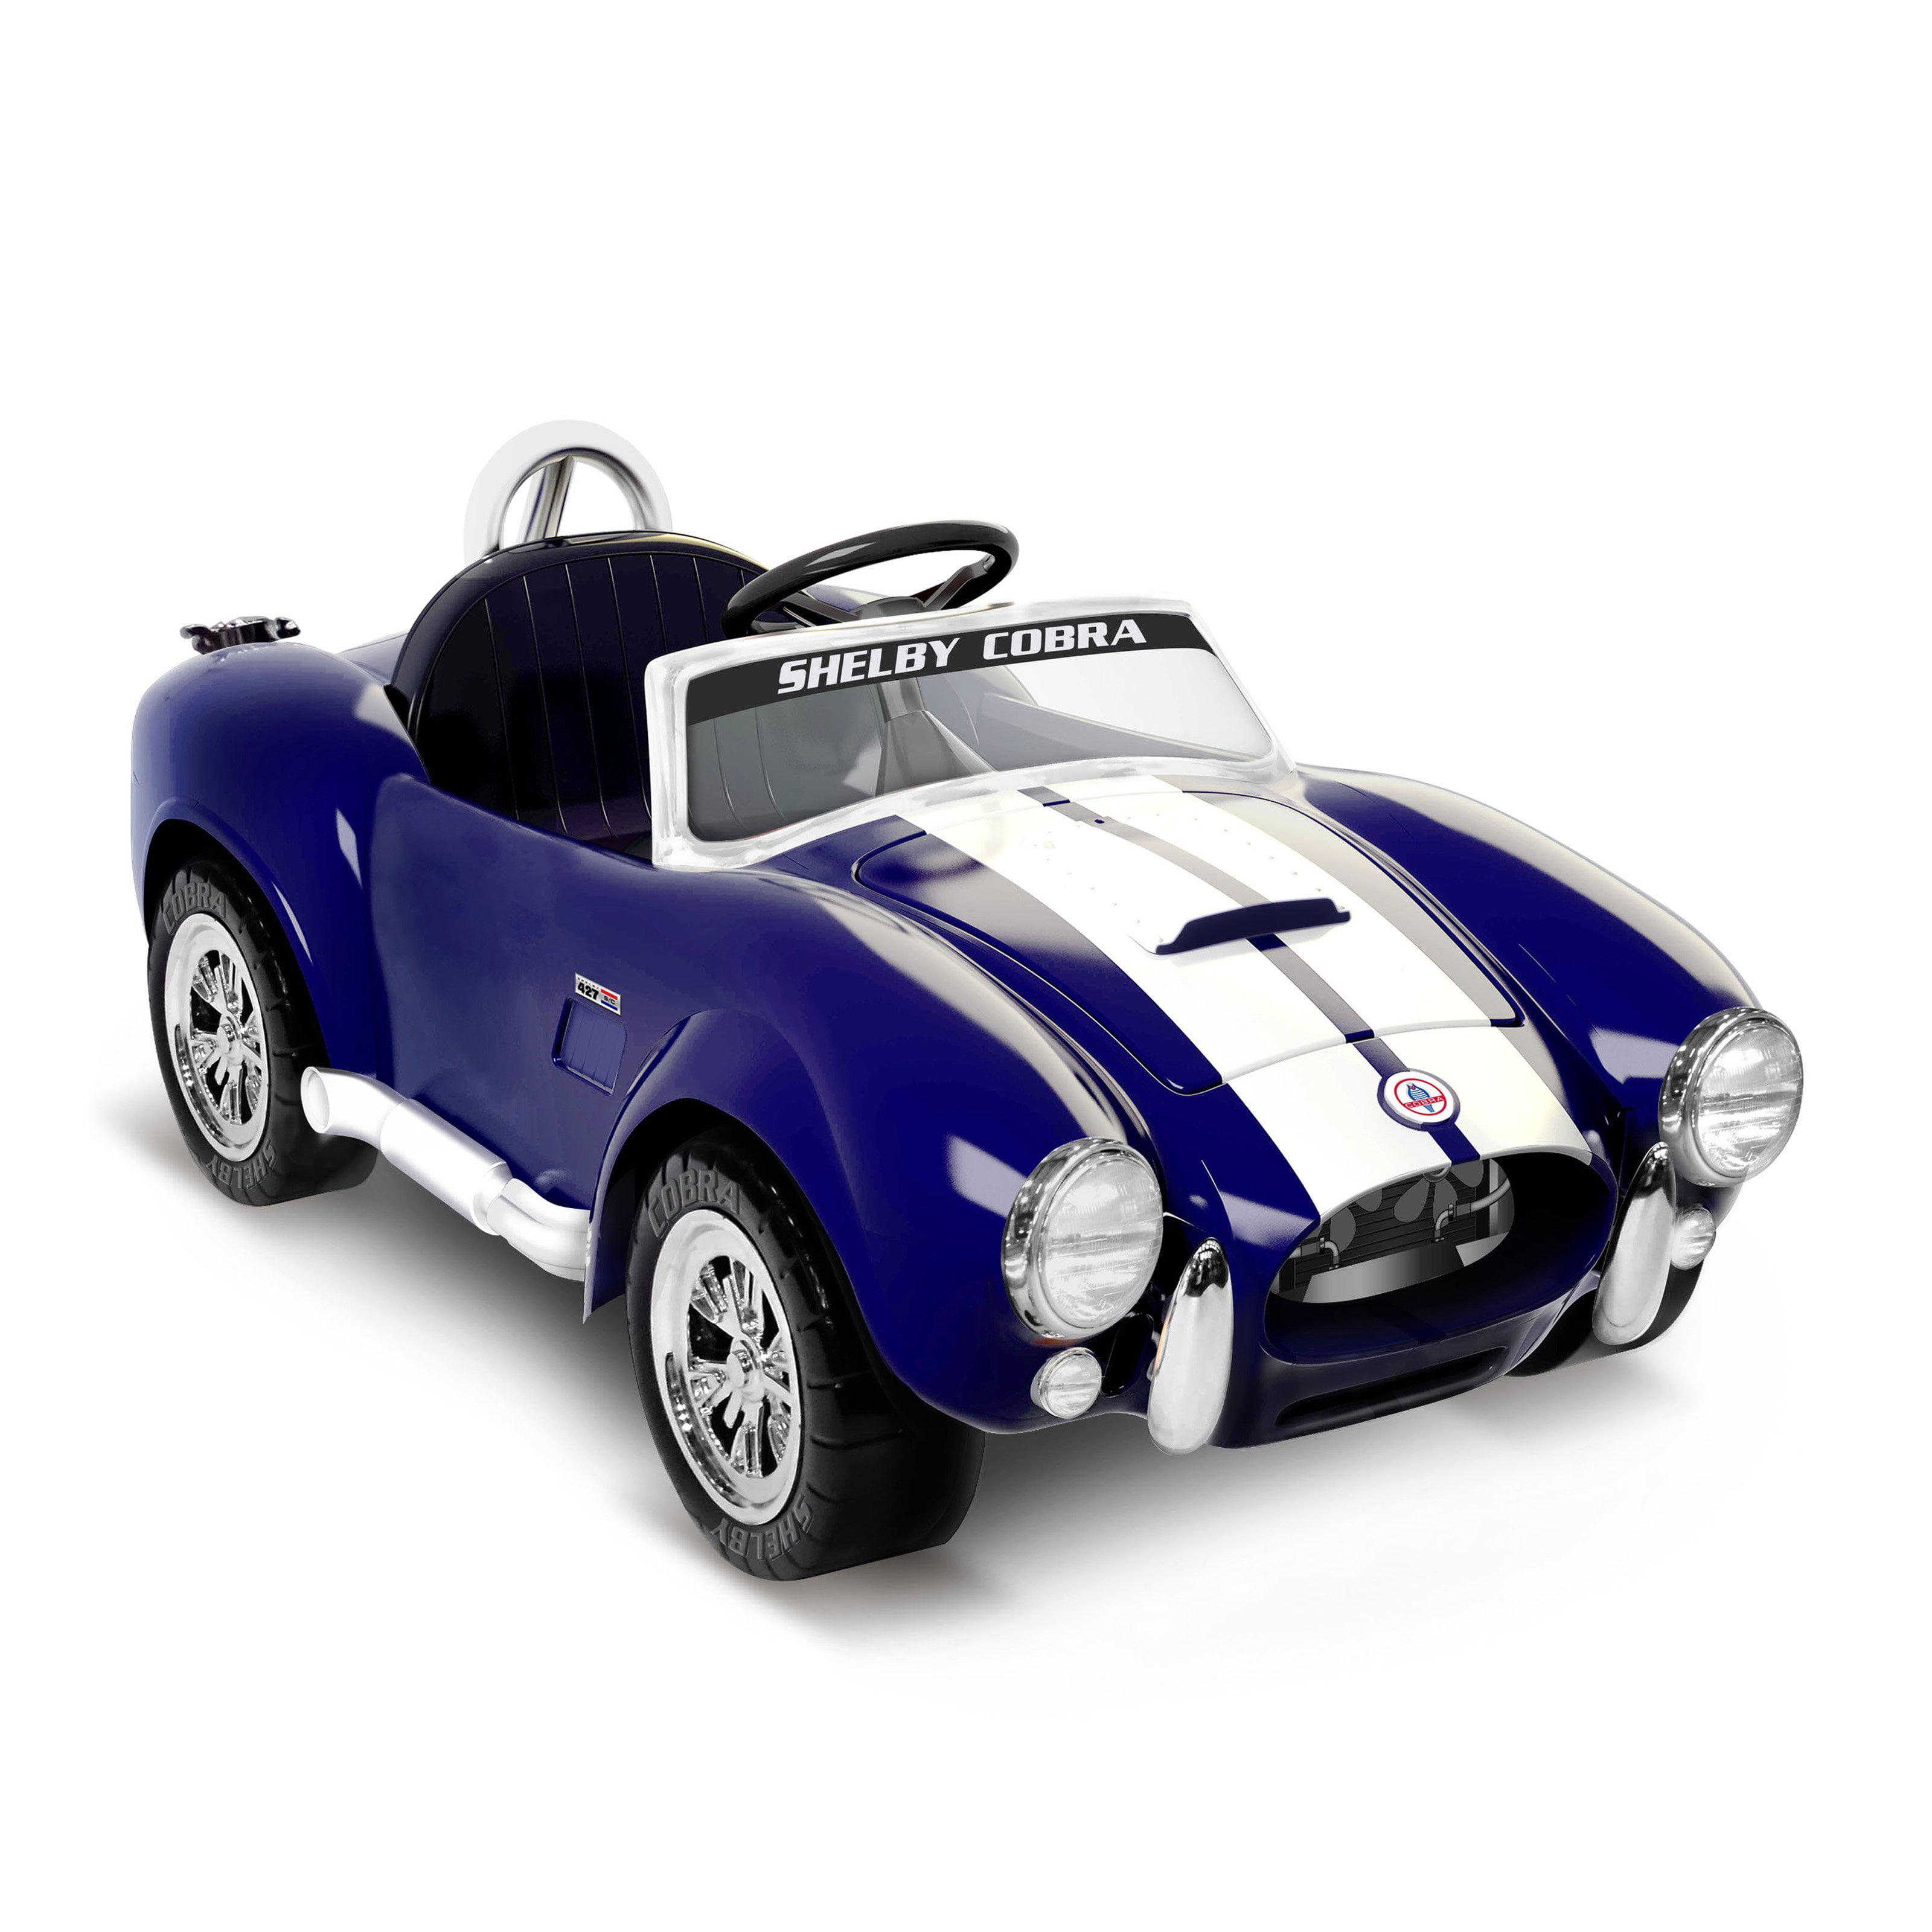 Kid Motorz Shelby Cobra 6-Volt Battery-Powered Ride-On